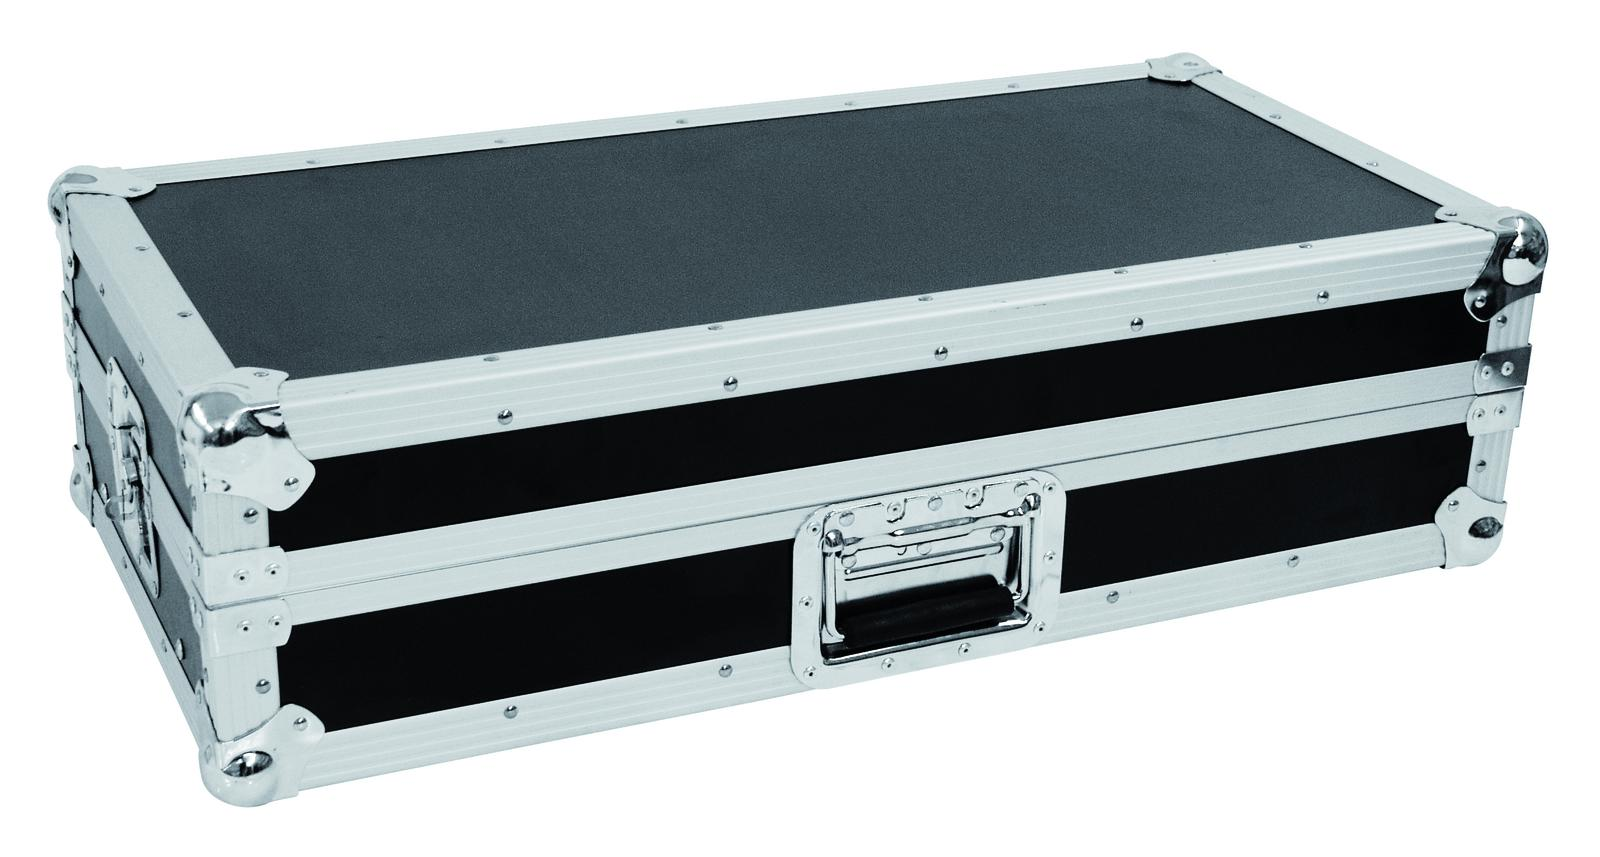 Mixer-Case Profi MCB-27, schräg, sw, 7HE